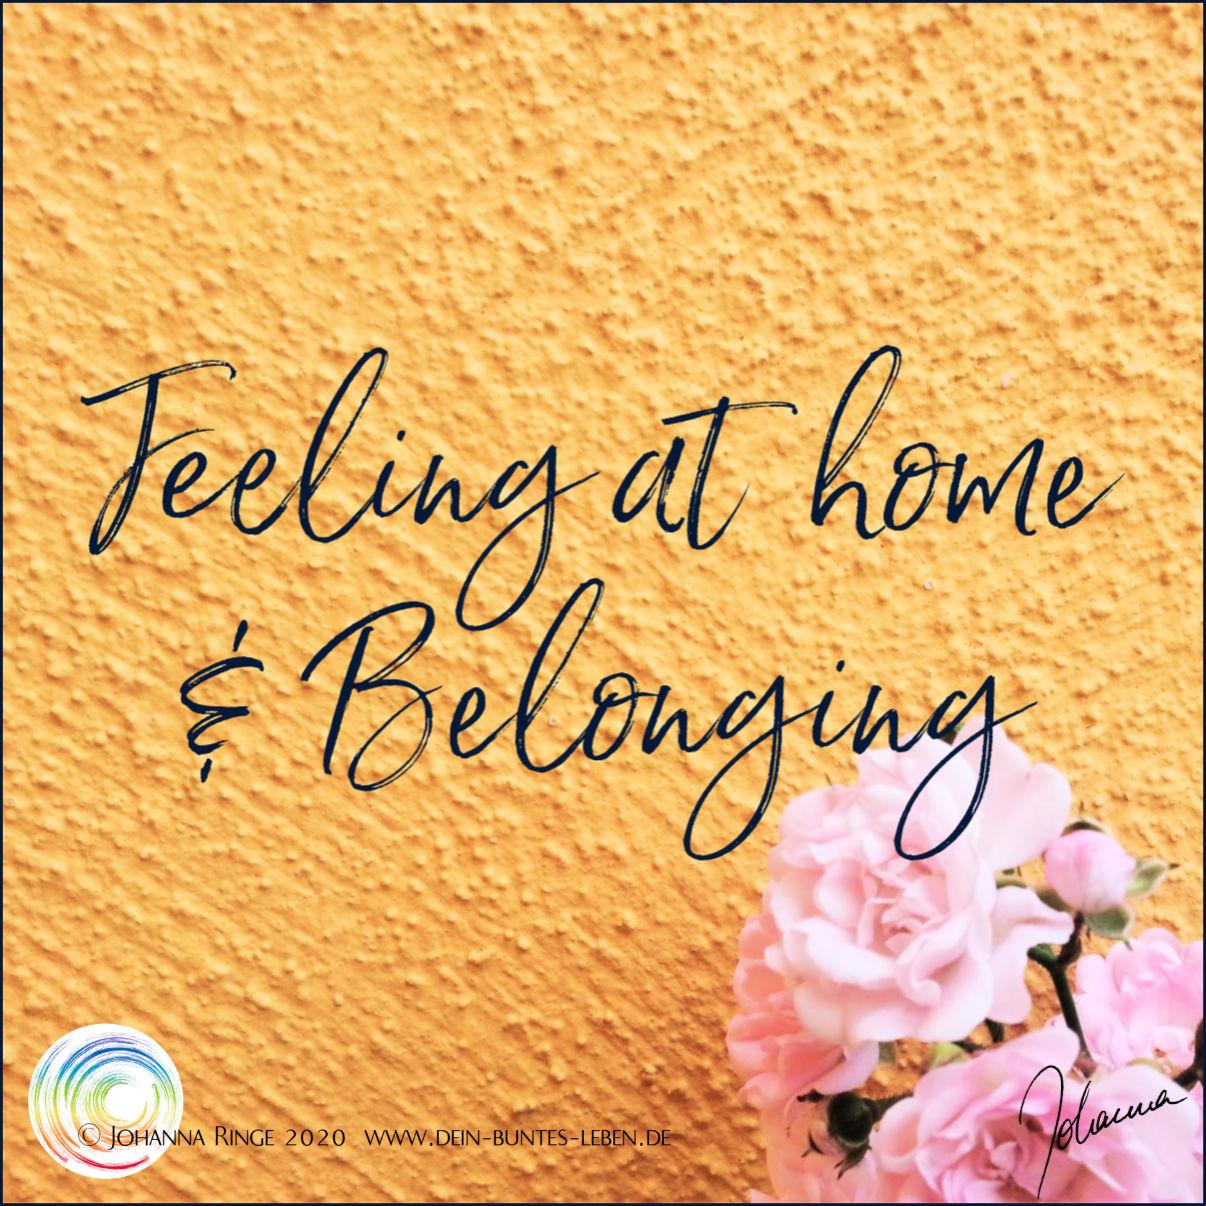 Feeling at home & belonging, text on photo of Roses before a wall. ©Johanna Ringe 2020. www.johannaringe.com